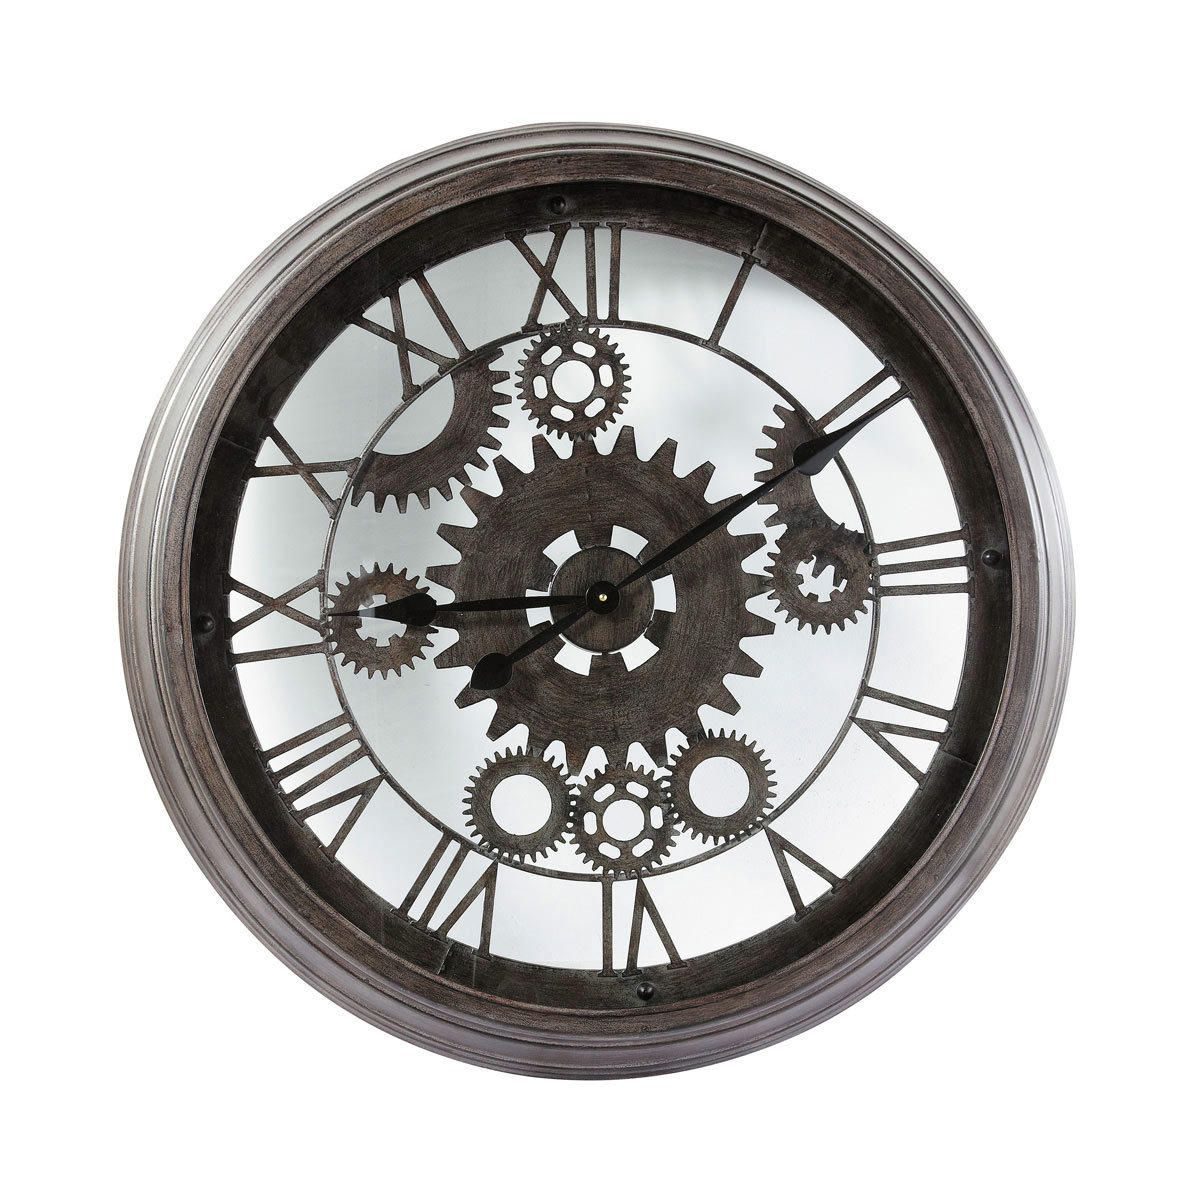 Metal industrial clock in black d 82cm idg e2 hotel lobby artwork selection pinterest - Horloge a poser maison du monde ...